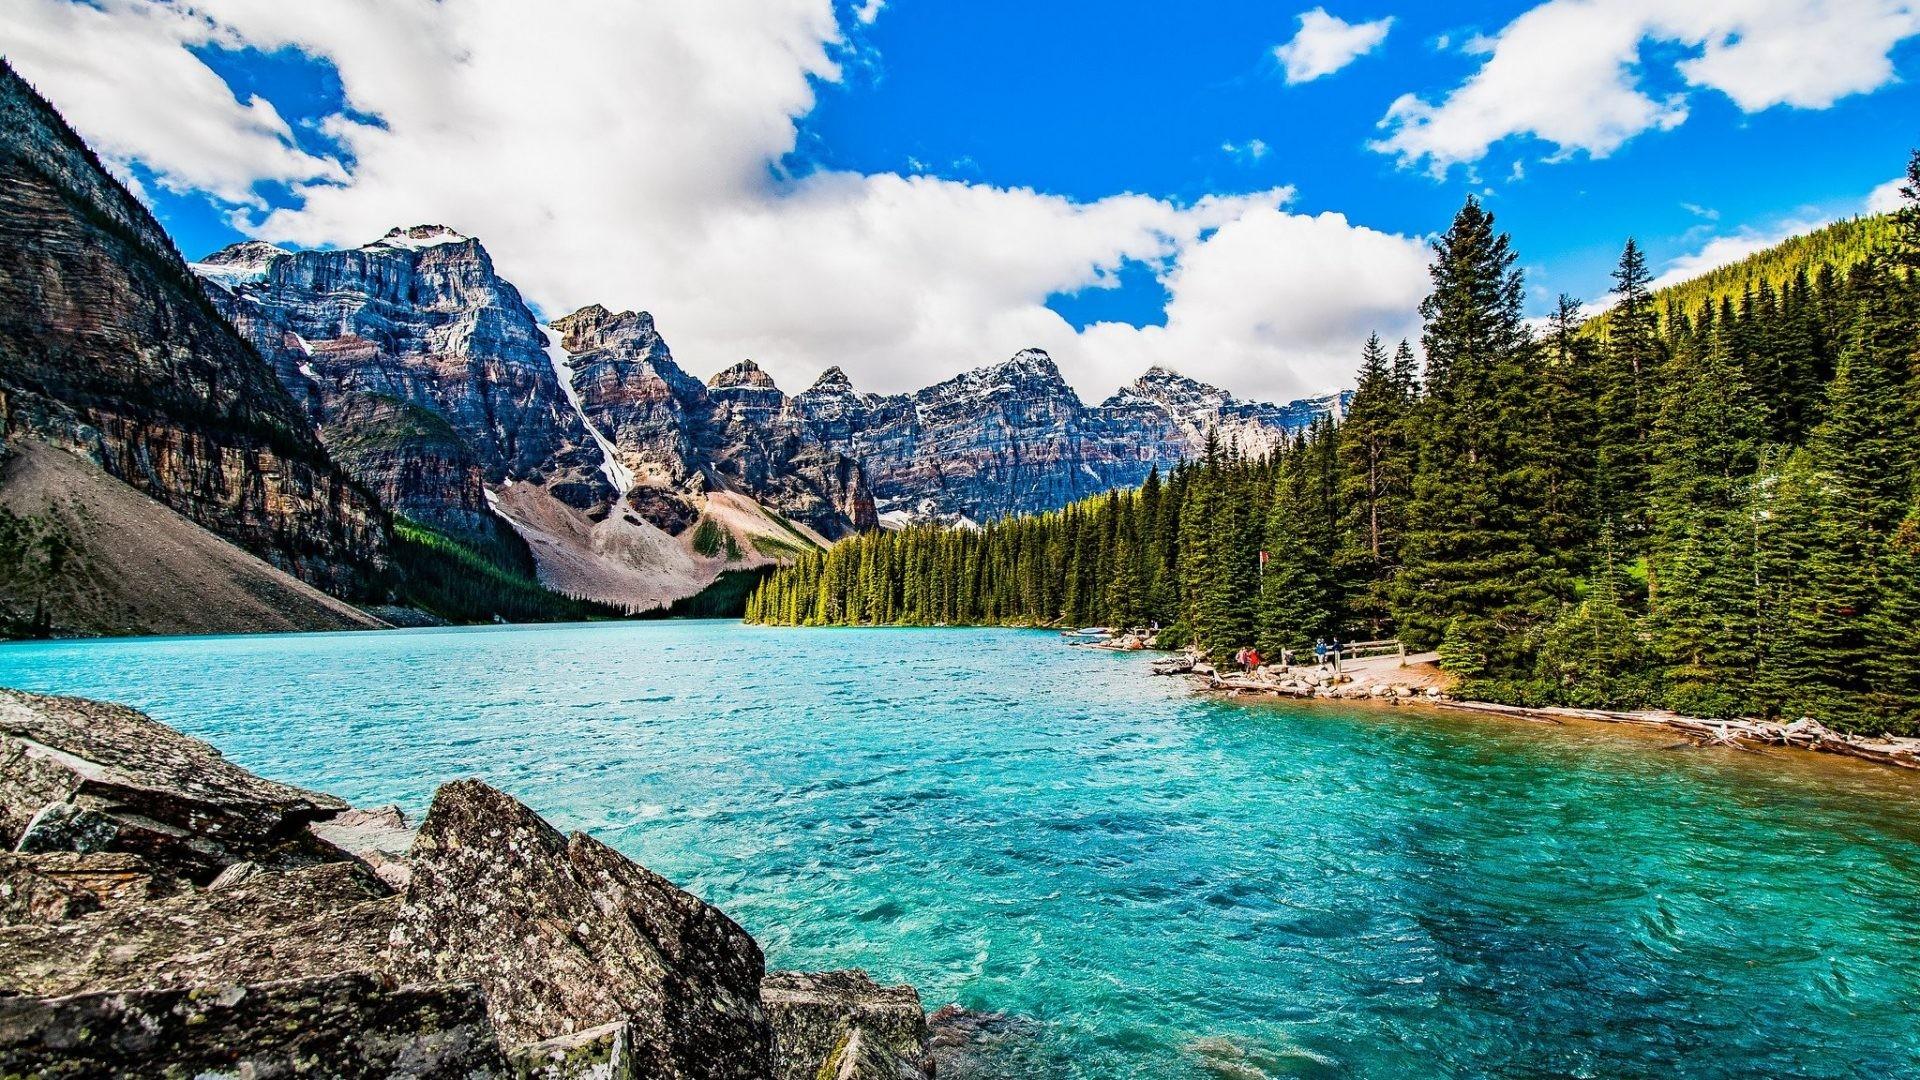 4K Ultra HD Nature Wallpaper (67+ Images